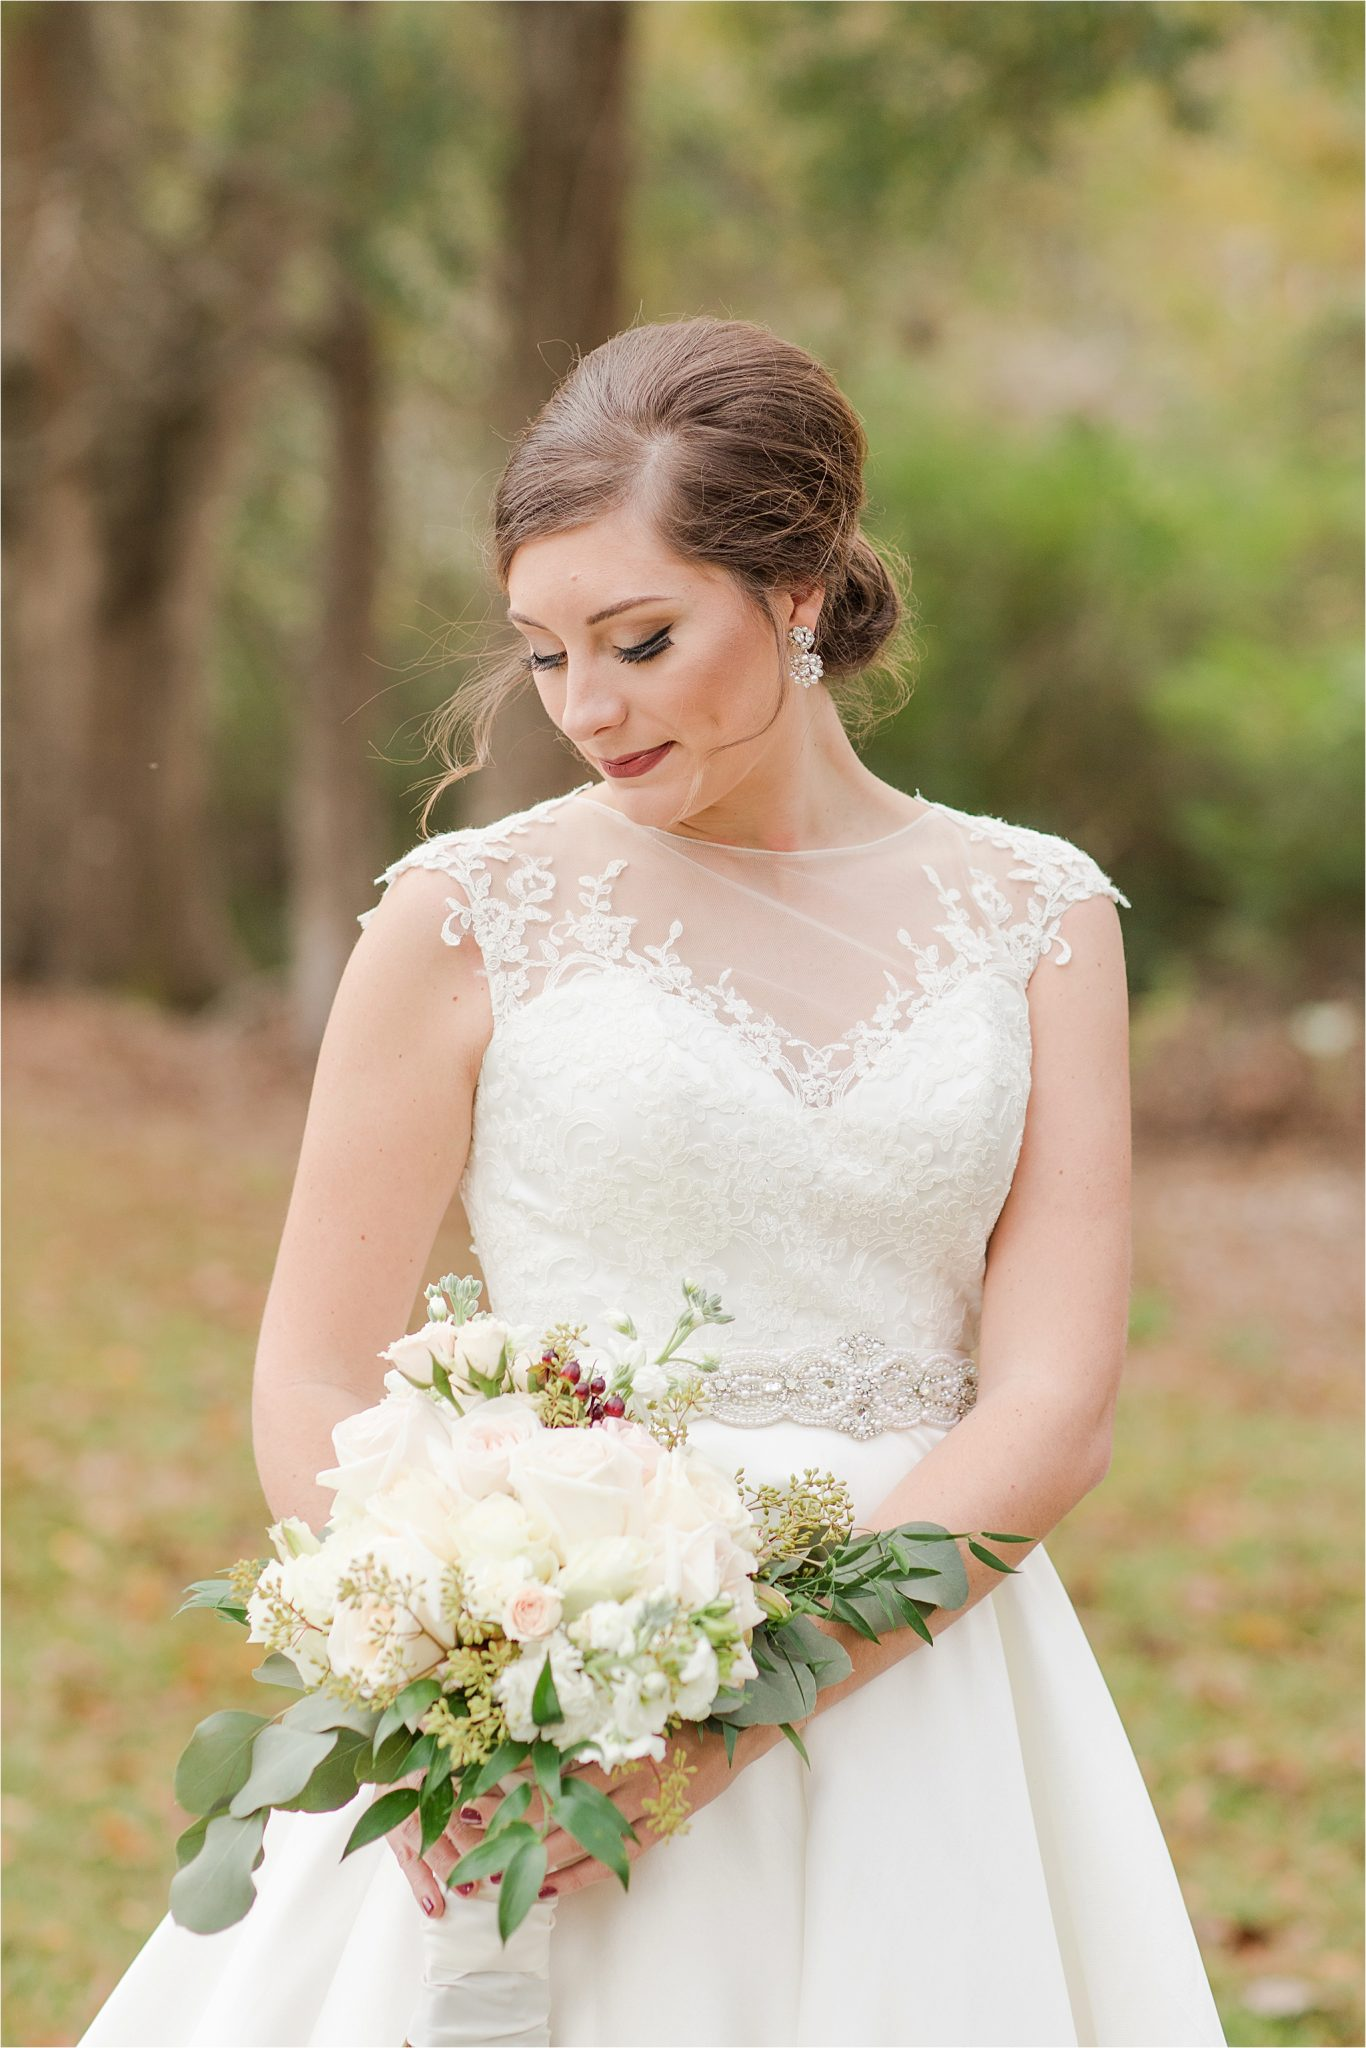 The Barn at Bridlewood Wedding-Hattiesburg, Mississippi-Kelsey + Blake-Wedding details-Barn wedding-Ruby wedding-Autumn themed wedding-Wedding dress-Wedding florals-Bridal shoot